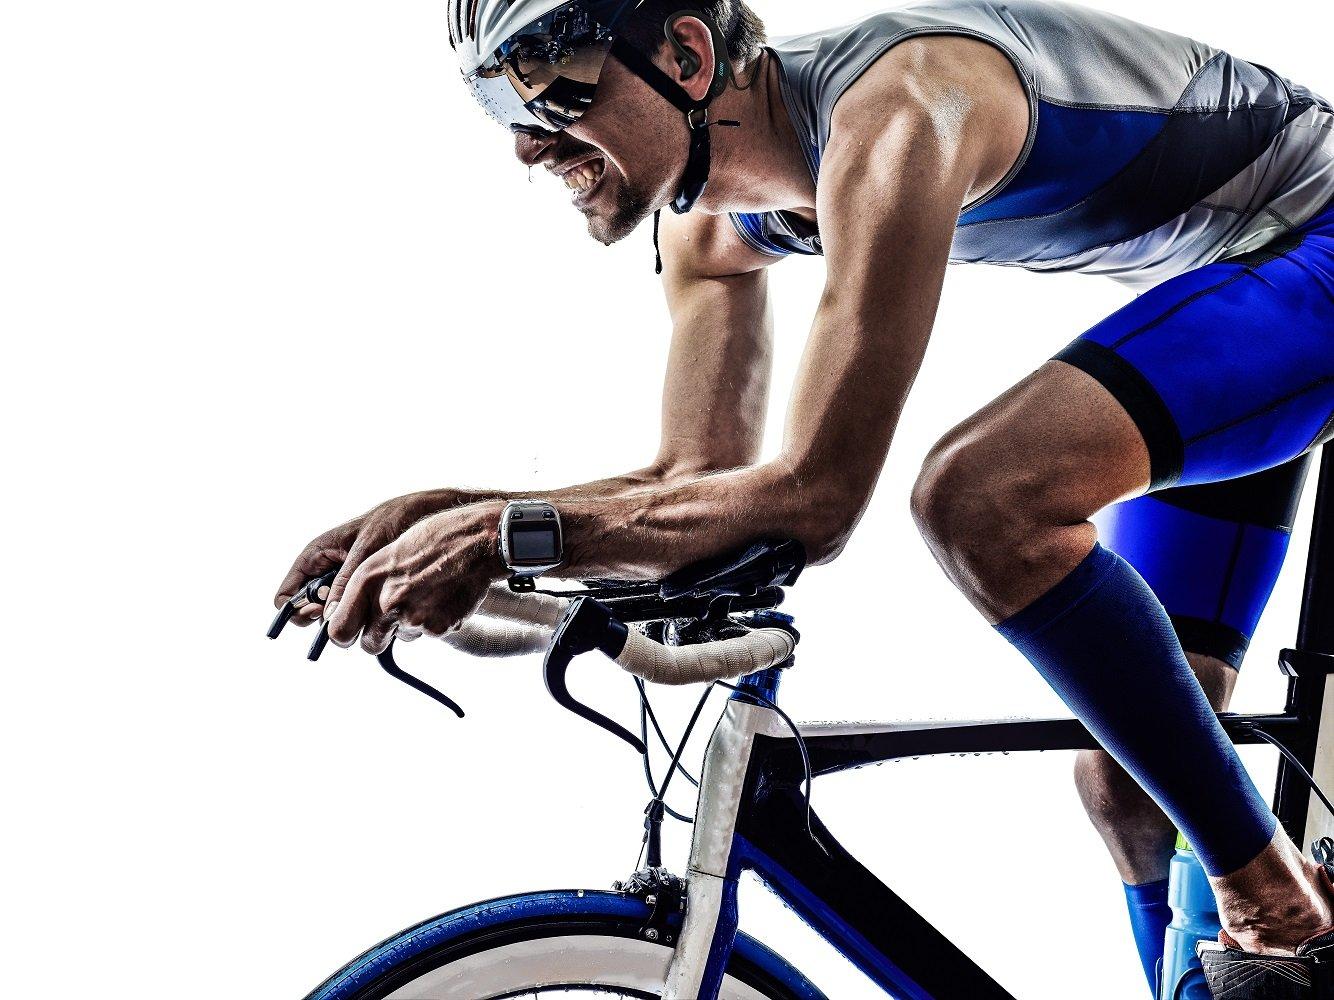 KuaiFit Sport Headphones - Heart Rate, Accelerometer, MP3, 8GB Memory, BLE, ANT+, Sweatproof, Audio Coach - Run Cycle Gym Triathlon by KuaiFit (Image #5)